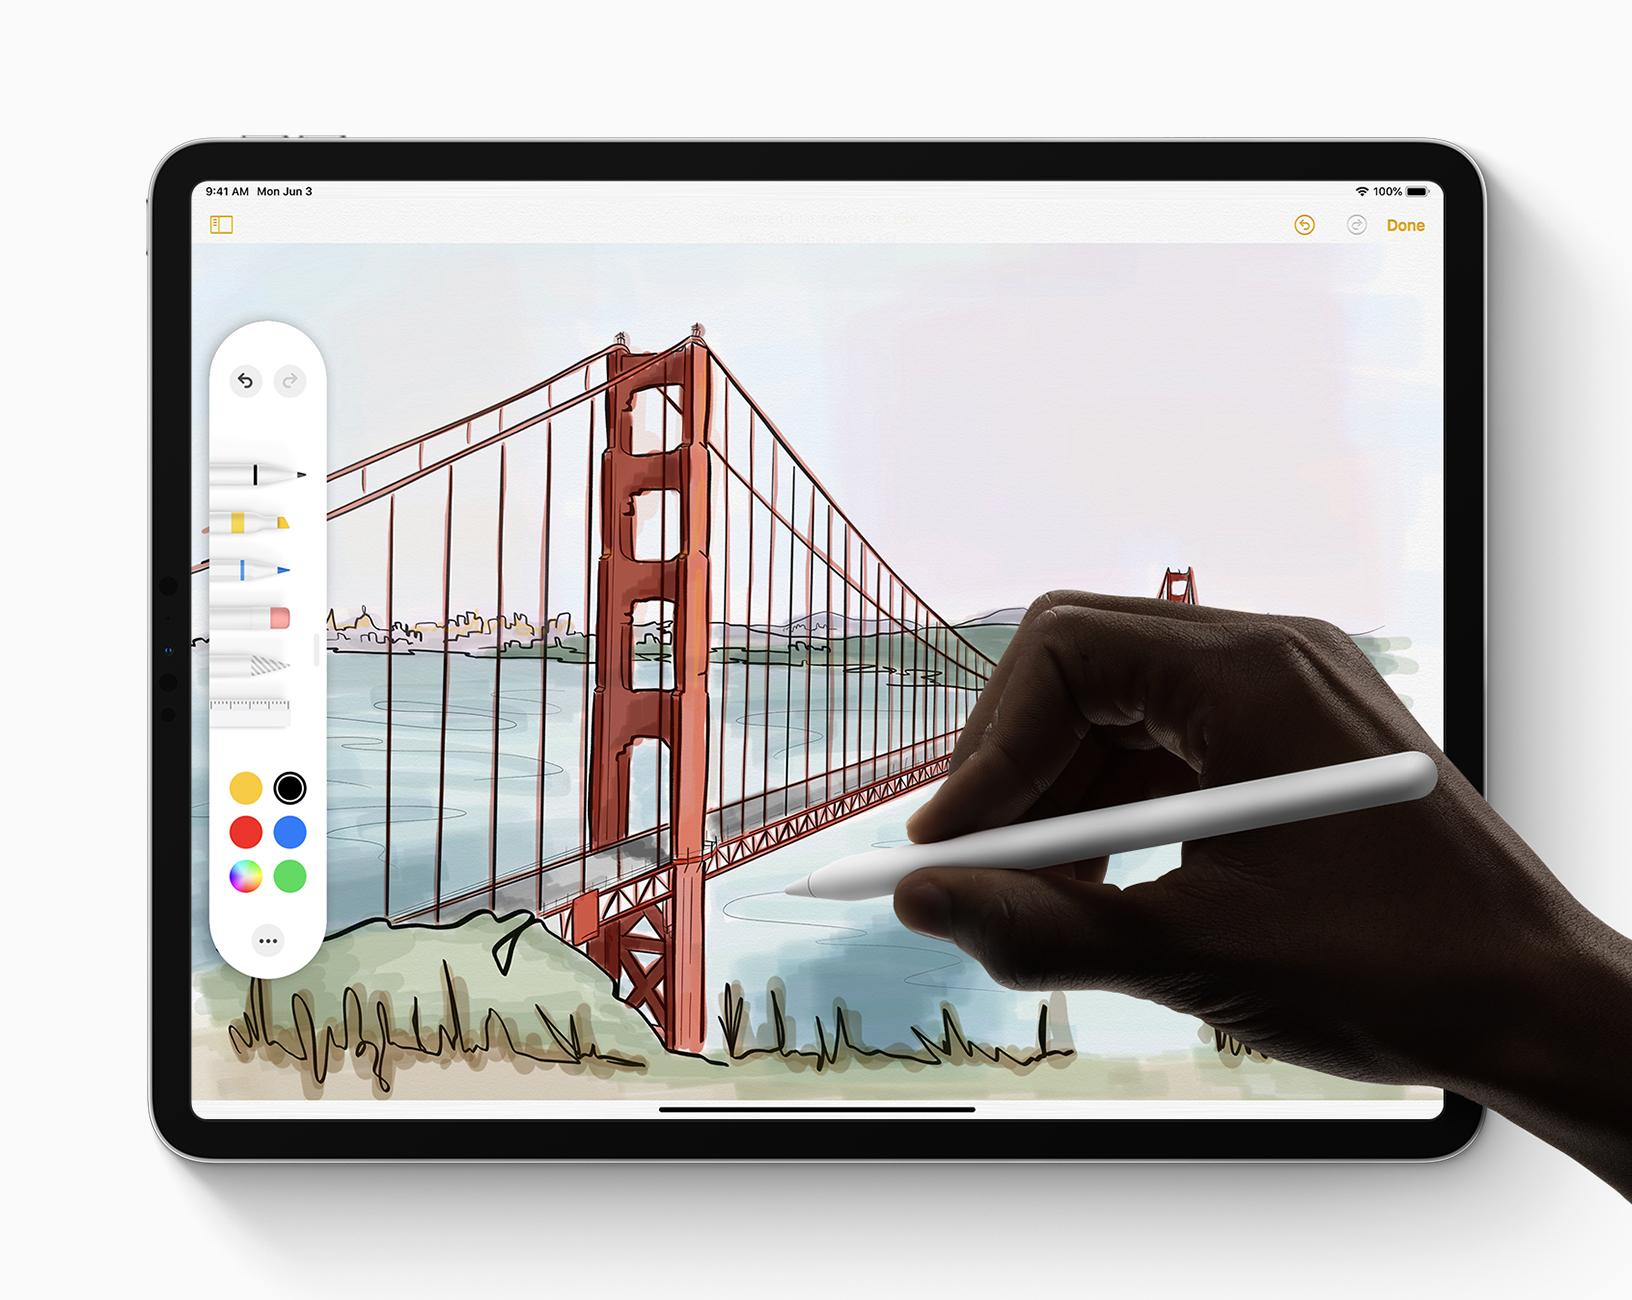 e374ff19e10 Apple_iPadOS_Apple-Pencil_060319_big.jpg